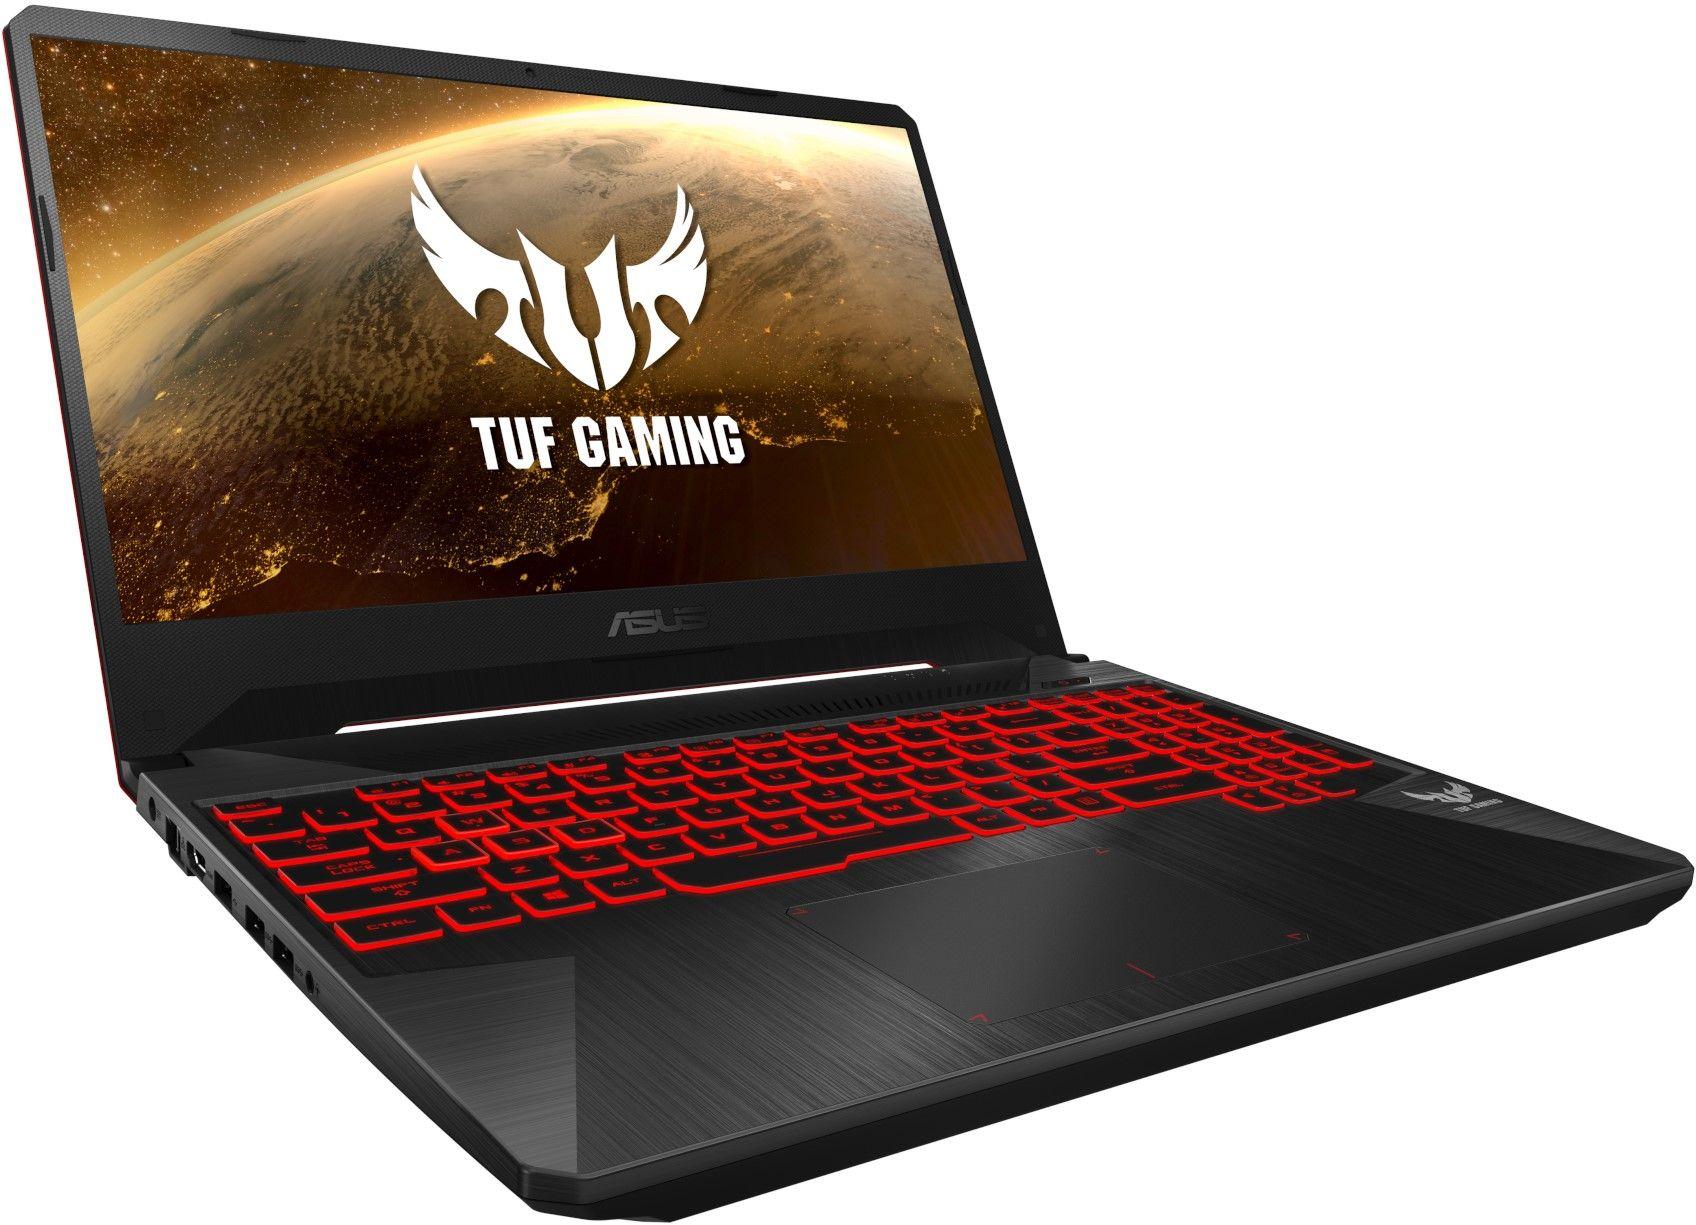 Гейминг лаптоп Asus - FX705GD-EW090, черен - 2